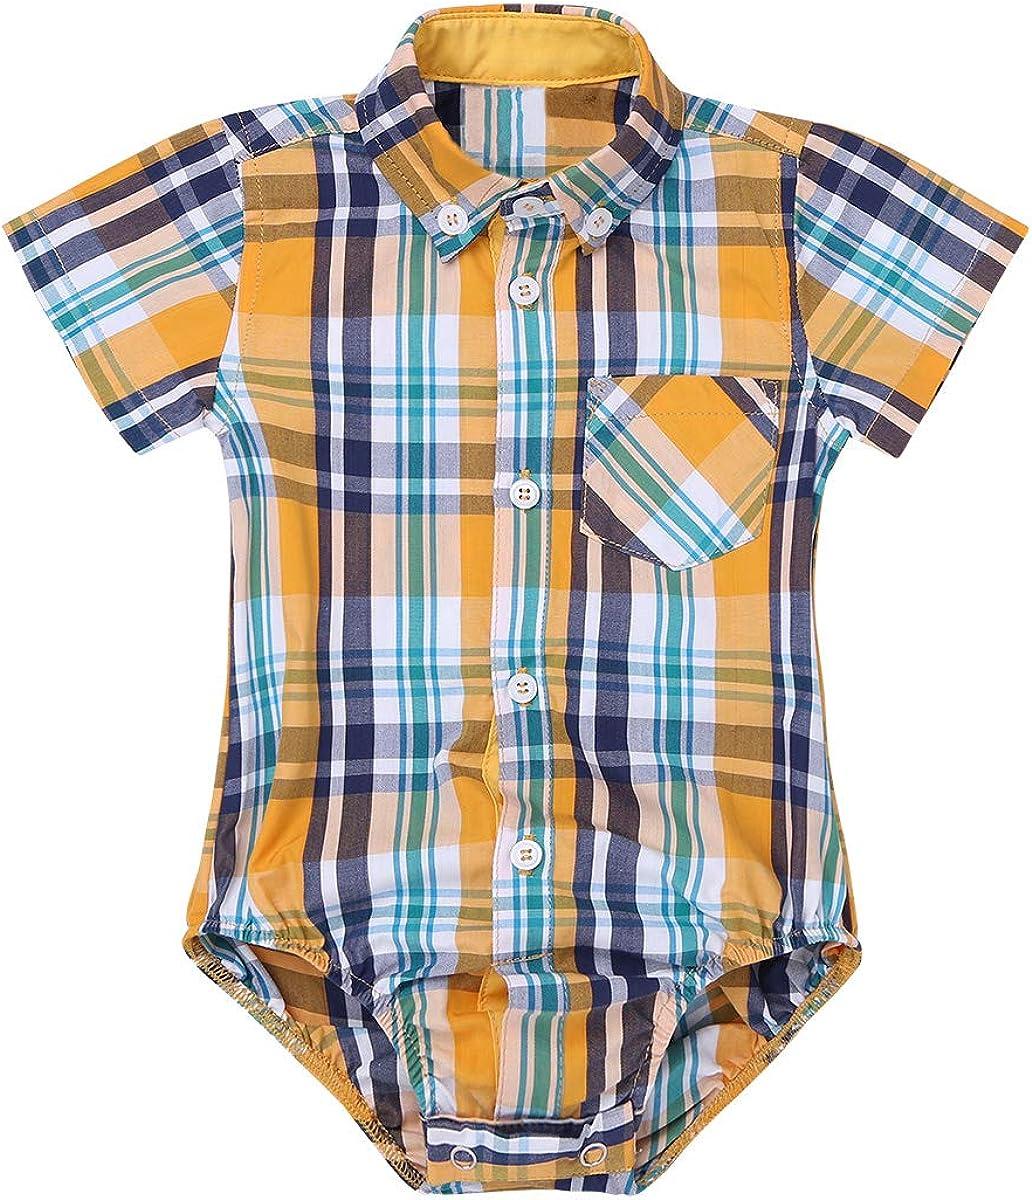 inlzdz Bebé Body Camisa Cuadros de Verano Mameluco Manga Corta Mono con Bolsillo Pelele de Algodón Suave Playsuit Infantil Ropa para Niños 0-24 Meses